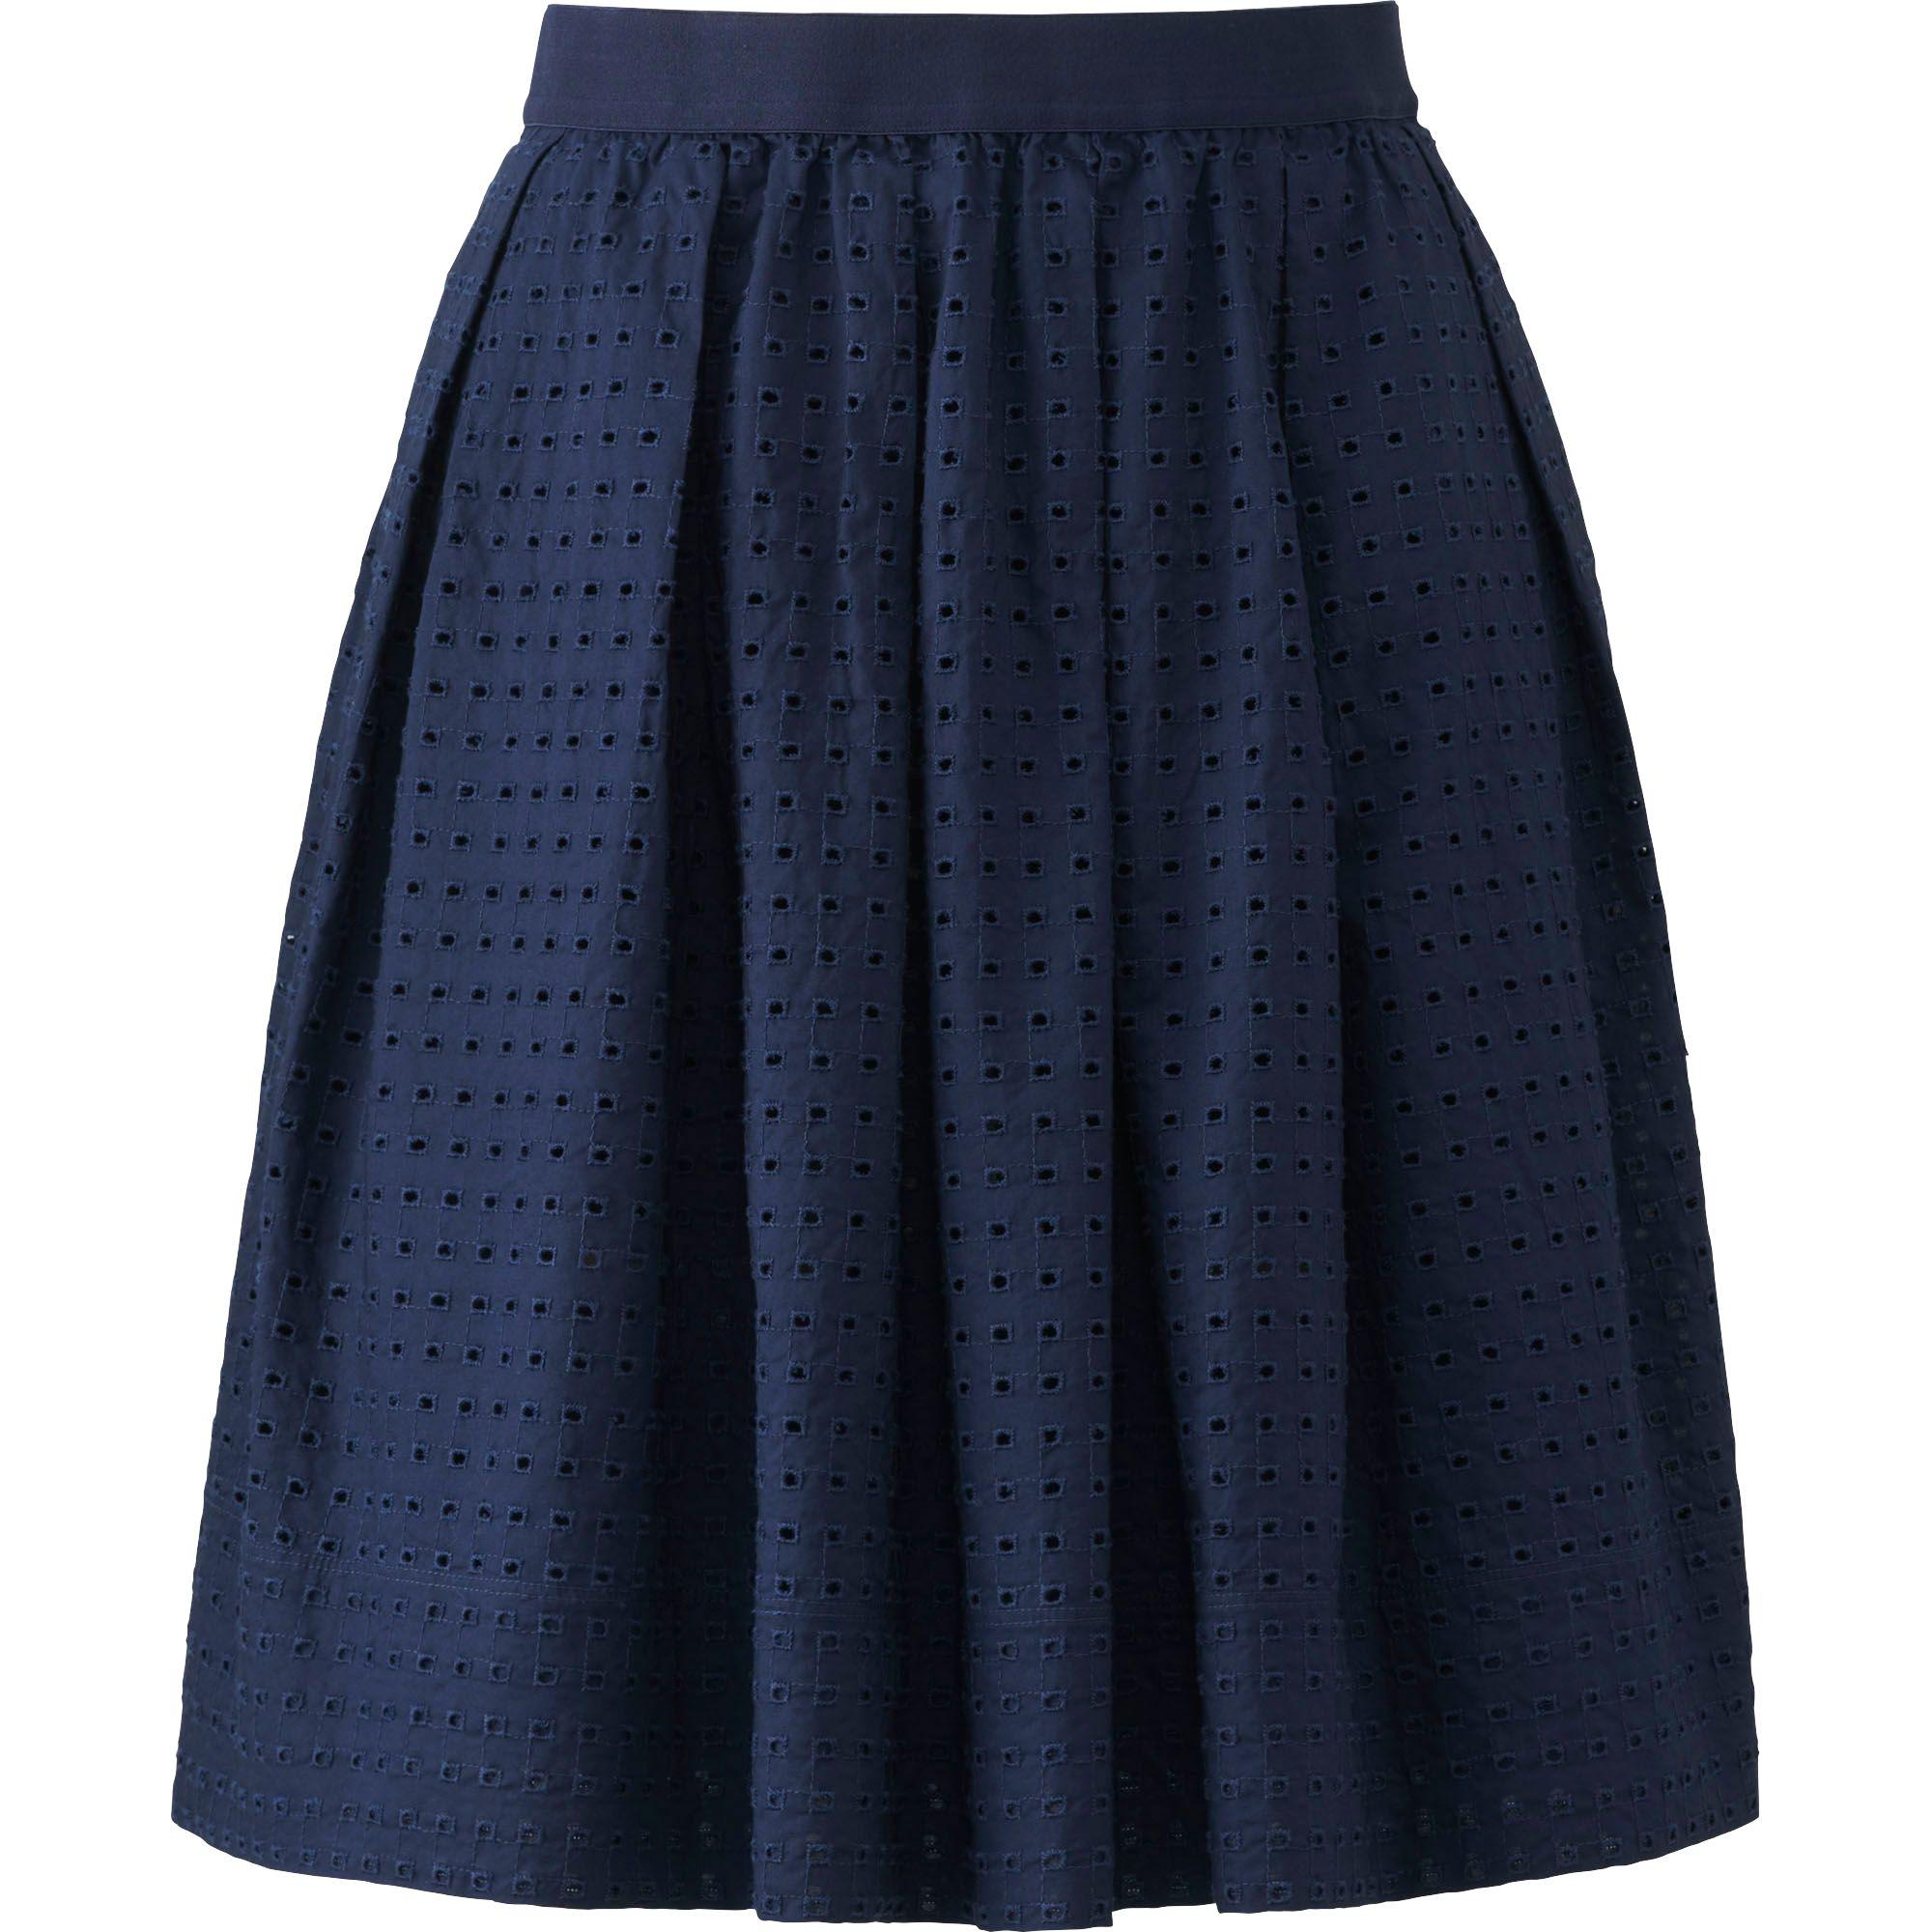 uniqlo s eyelet mini skirt in blue navy save 50